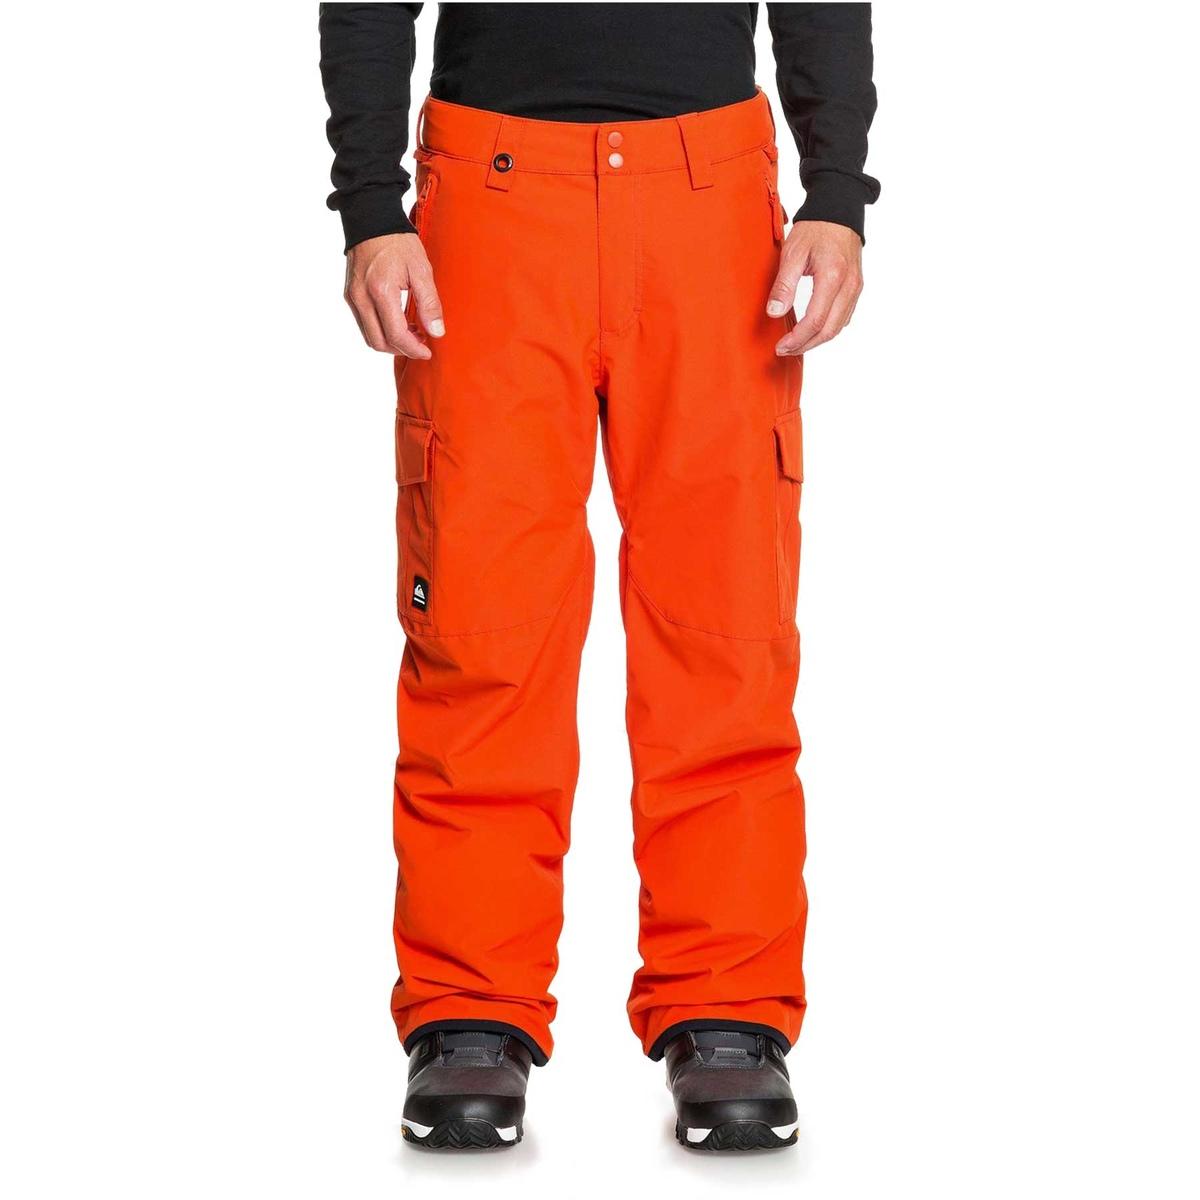 Prezzi Quiksilver pantaloni porter